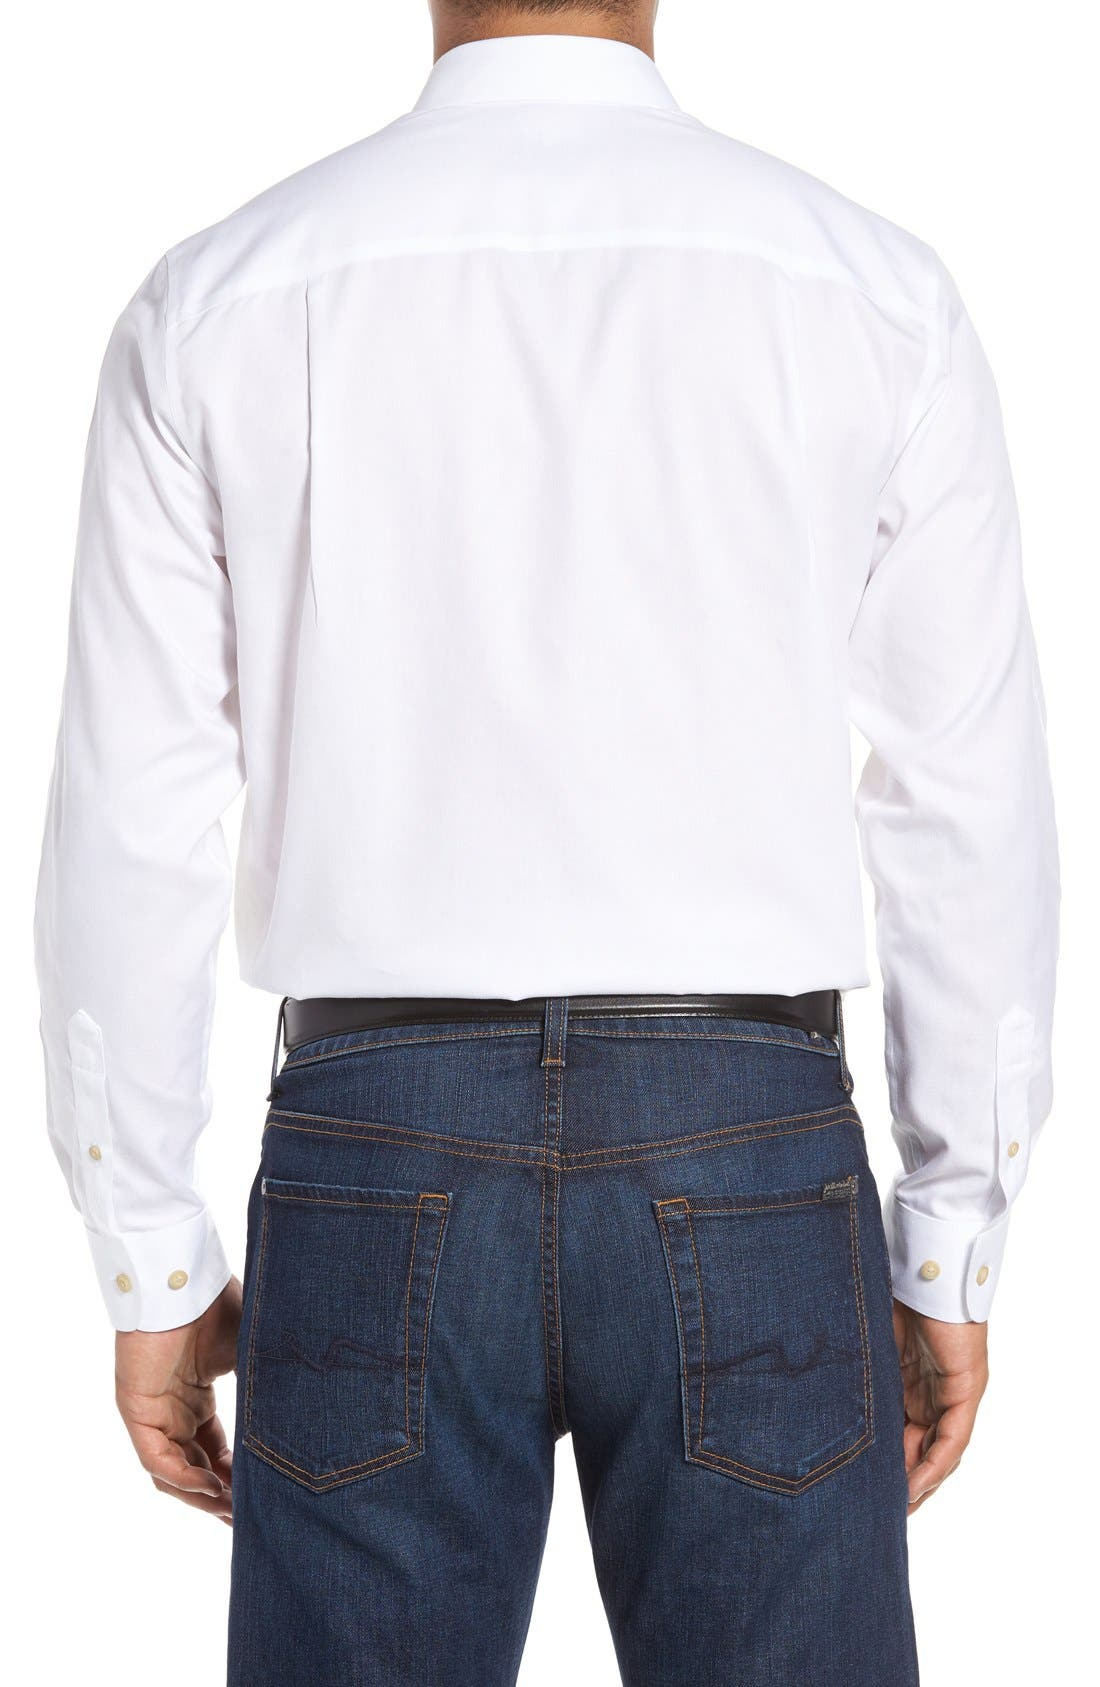 San Juan Classic Fit Wrinkle Free Solid Sport Shirt,                             Alternate thumbnail 2, color,                             White